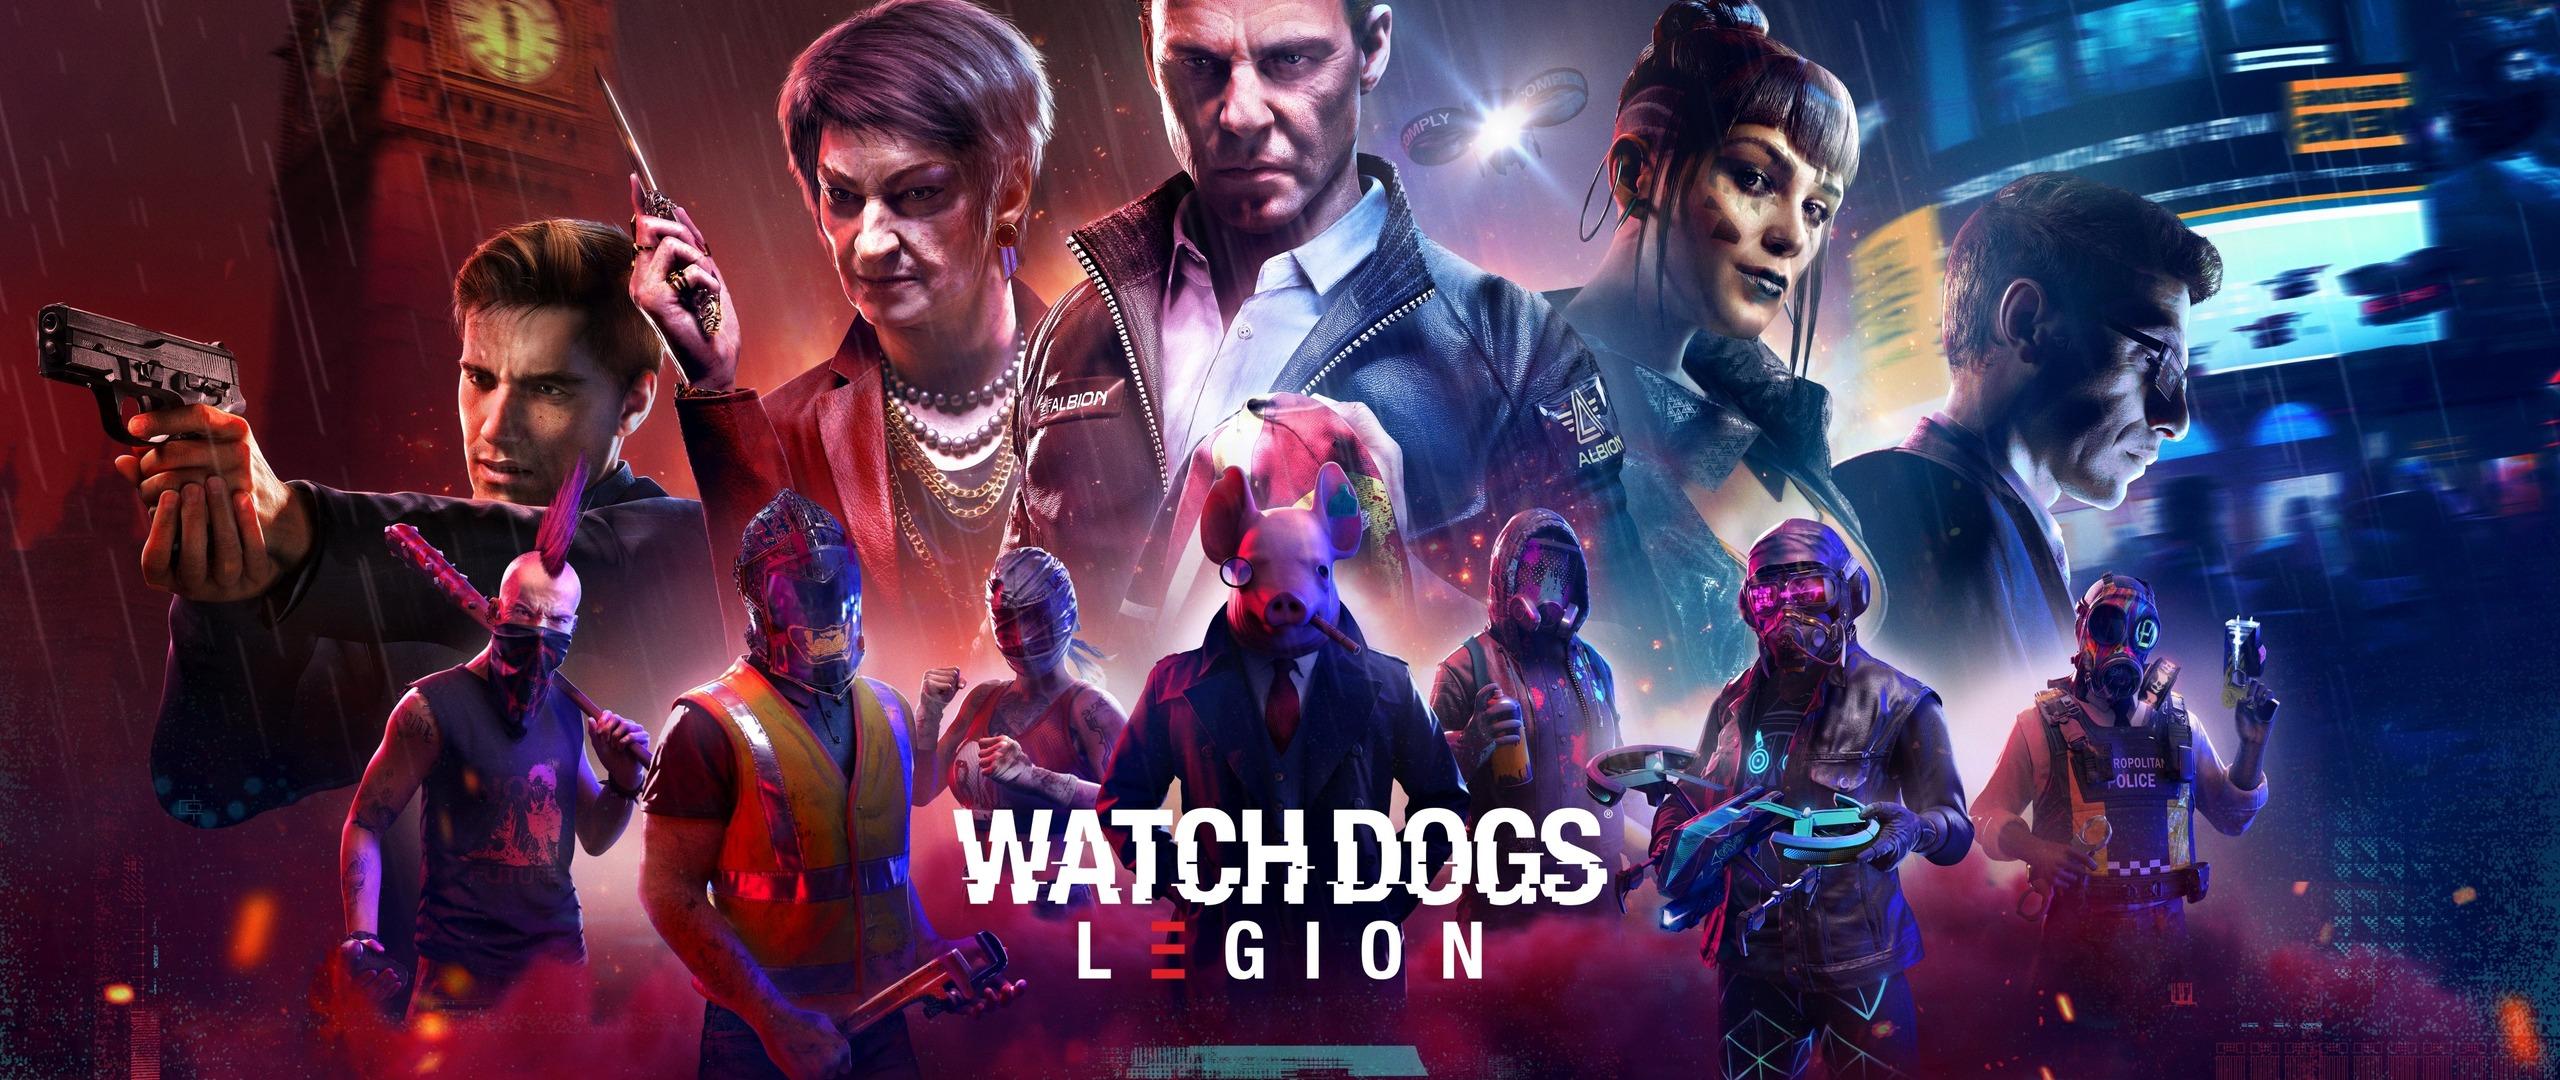 2560x1080 Watch Dogs Legion 4k 2020 2560x1080 Resolution ...